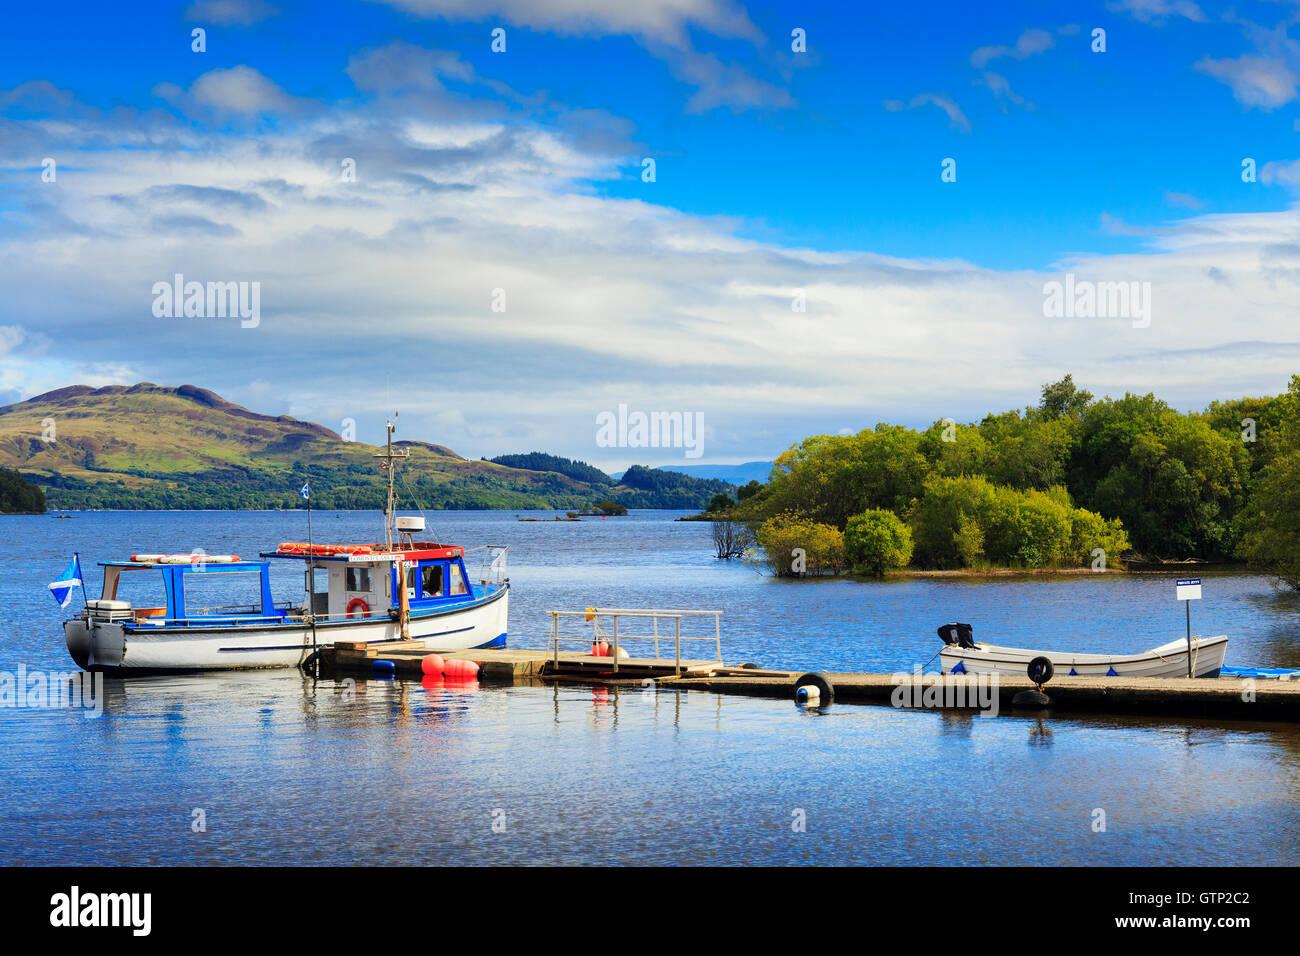 Small ferry at a pier on Loch Lomond, Luss, Scotland, UK - Stock Image